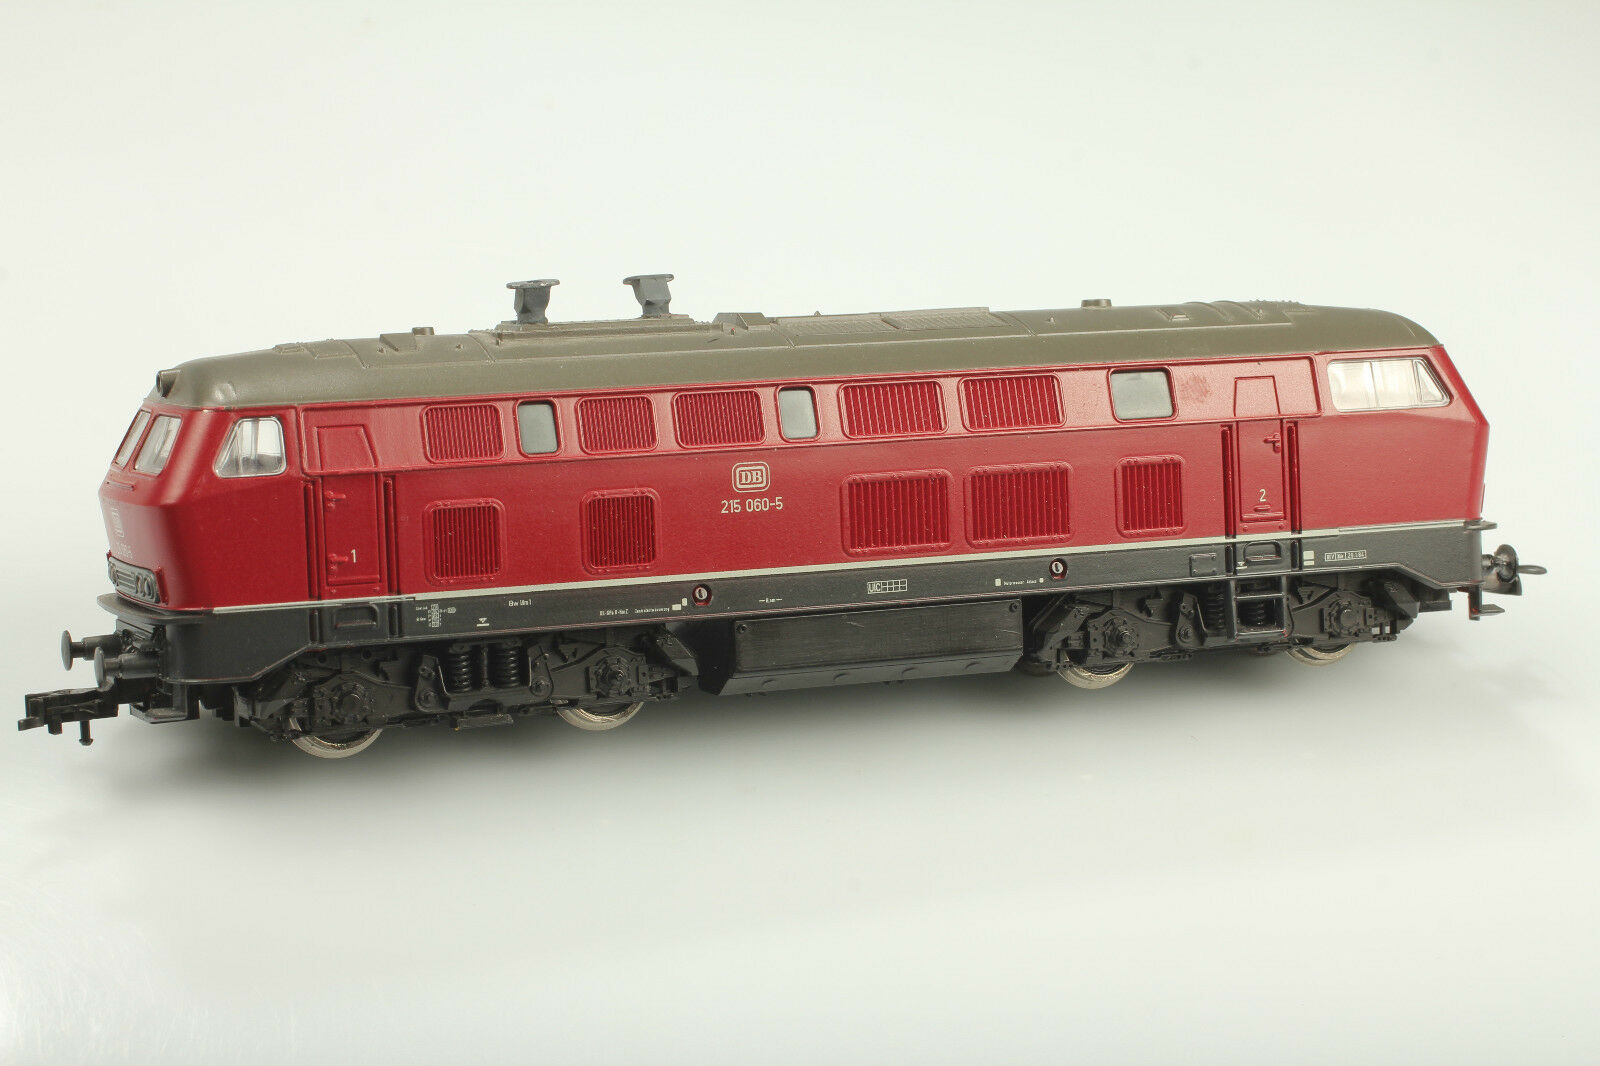 Mountain Express 3430 Japan Blechspielzeug Up-To-Date-Styling Blechspielzeug Nutzfahrzeuge